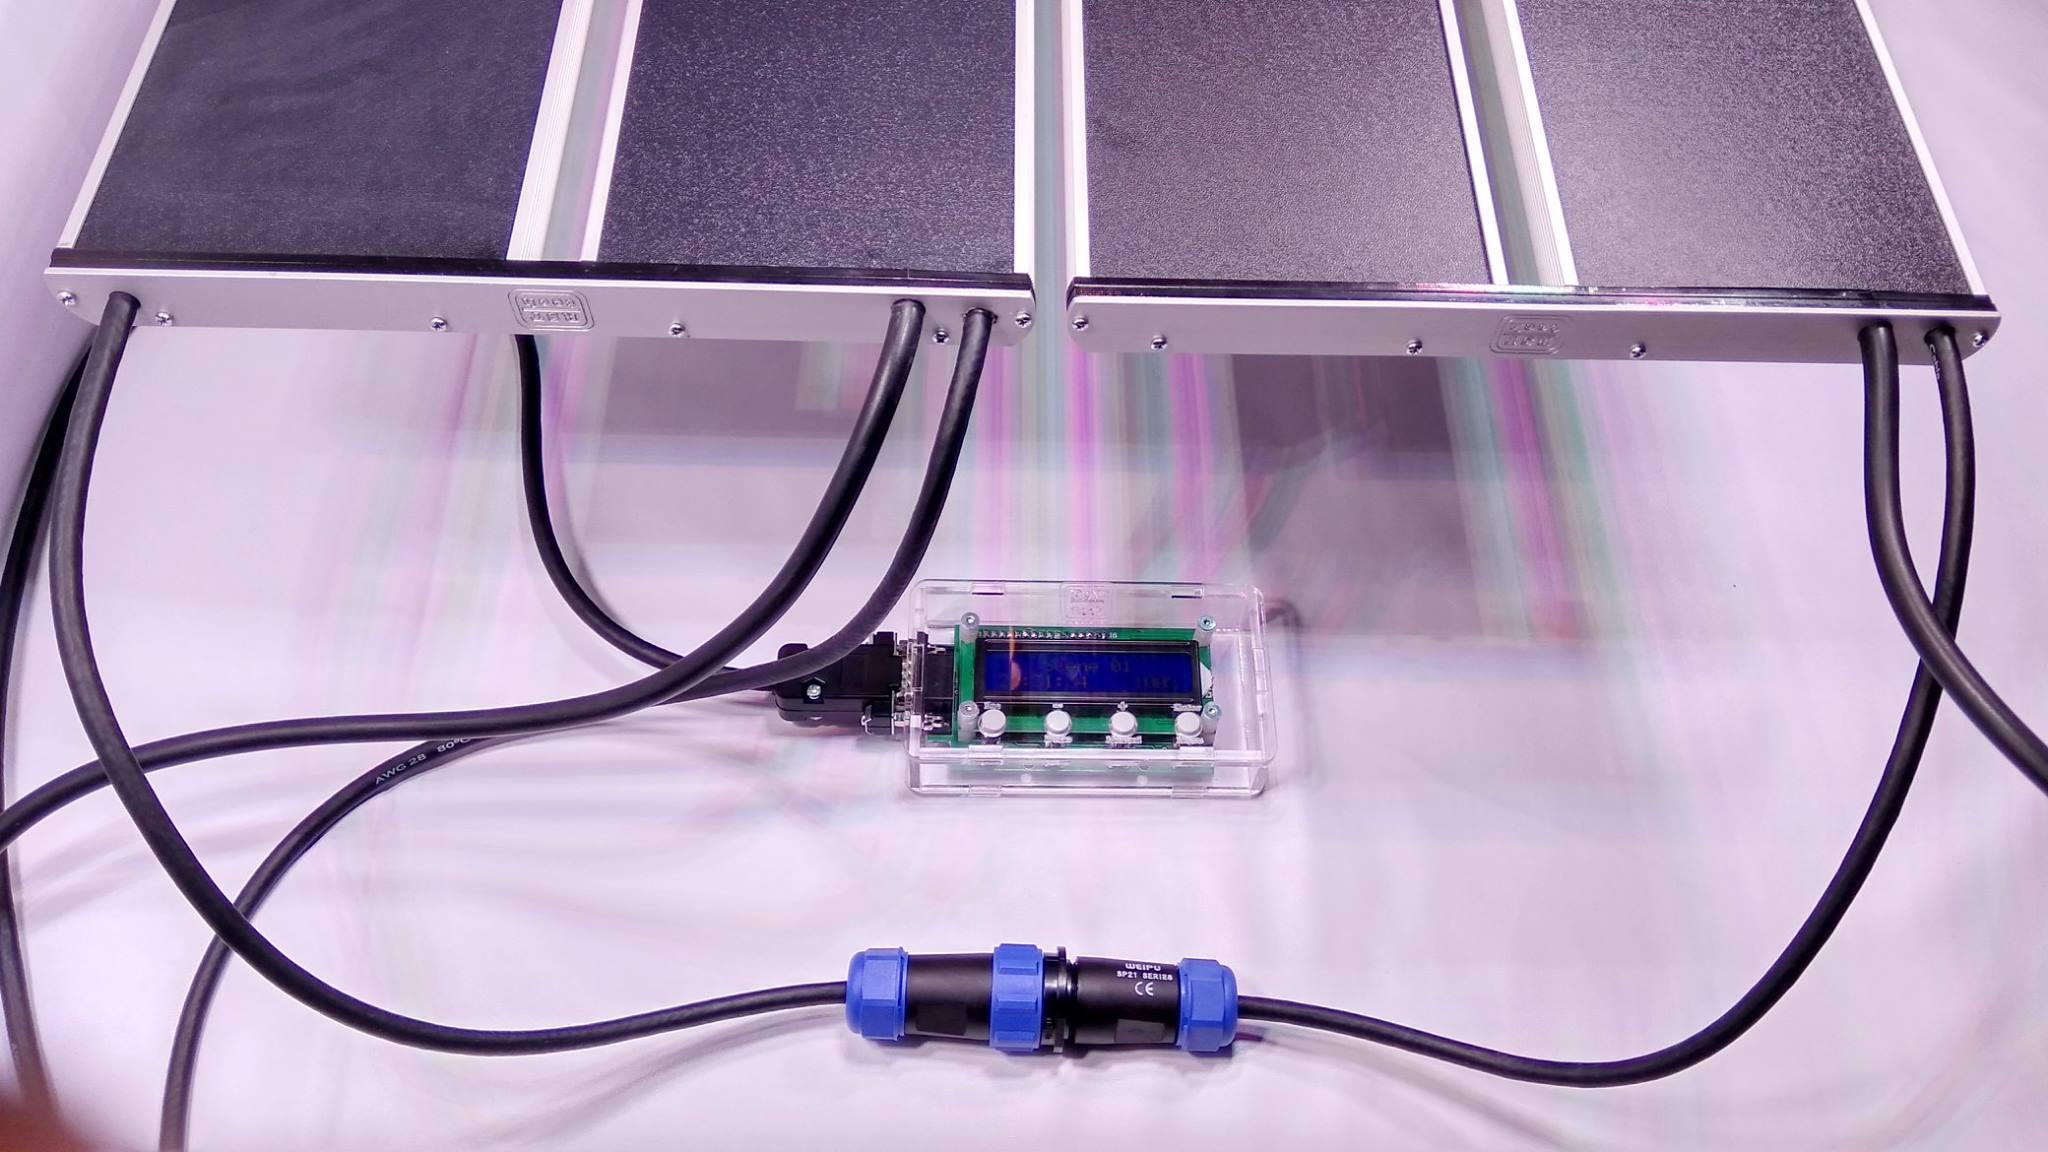 7-канальный контроллер RST-tech